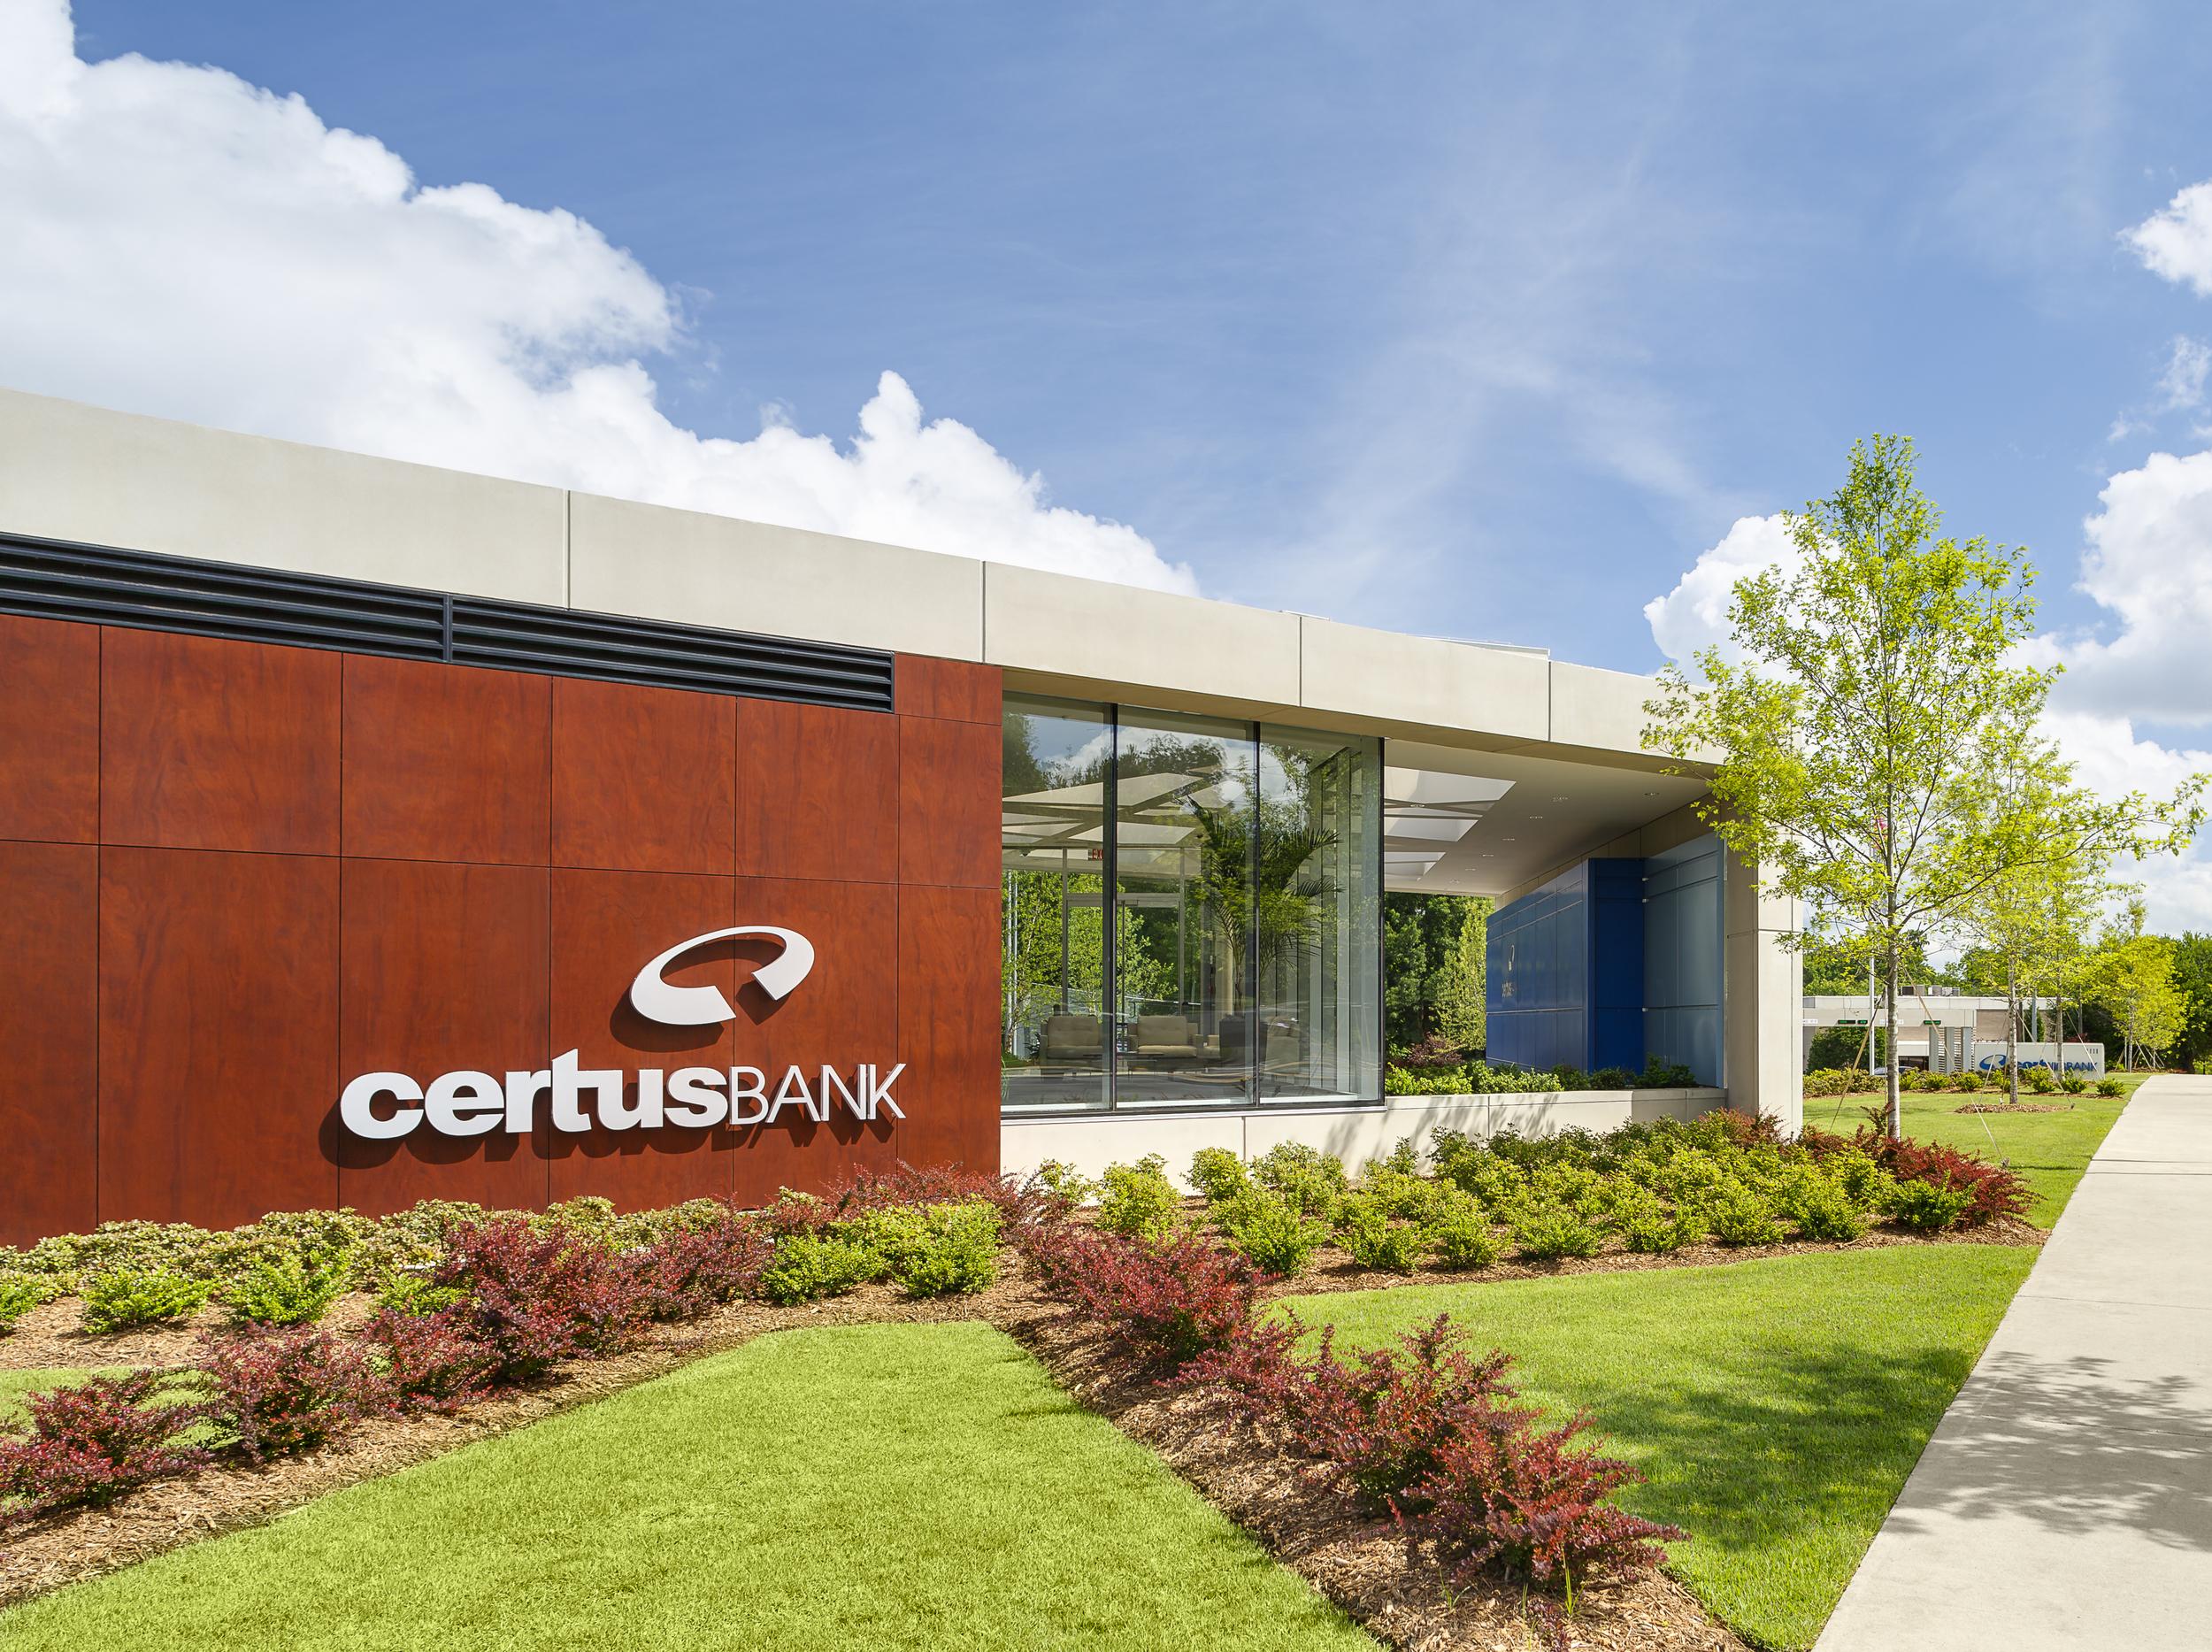 certusbank_branch_greenville_south_carolina_exterior_signage.jpg